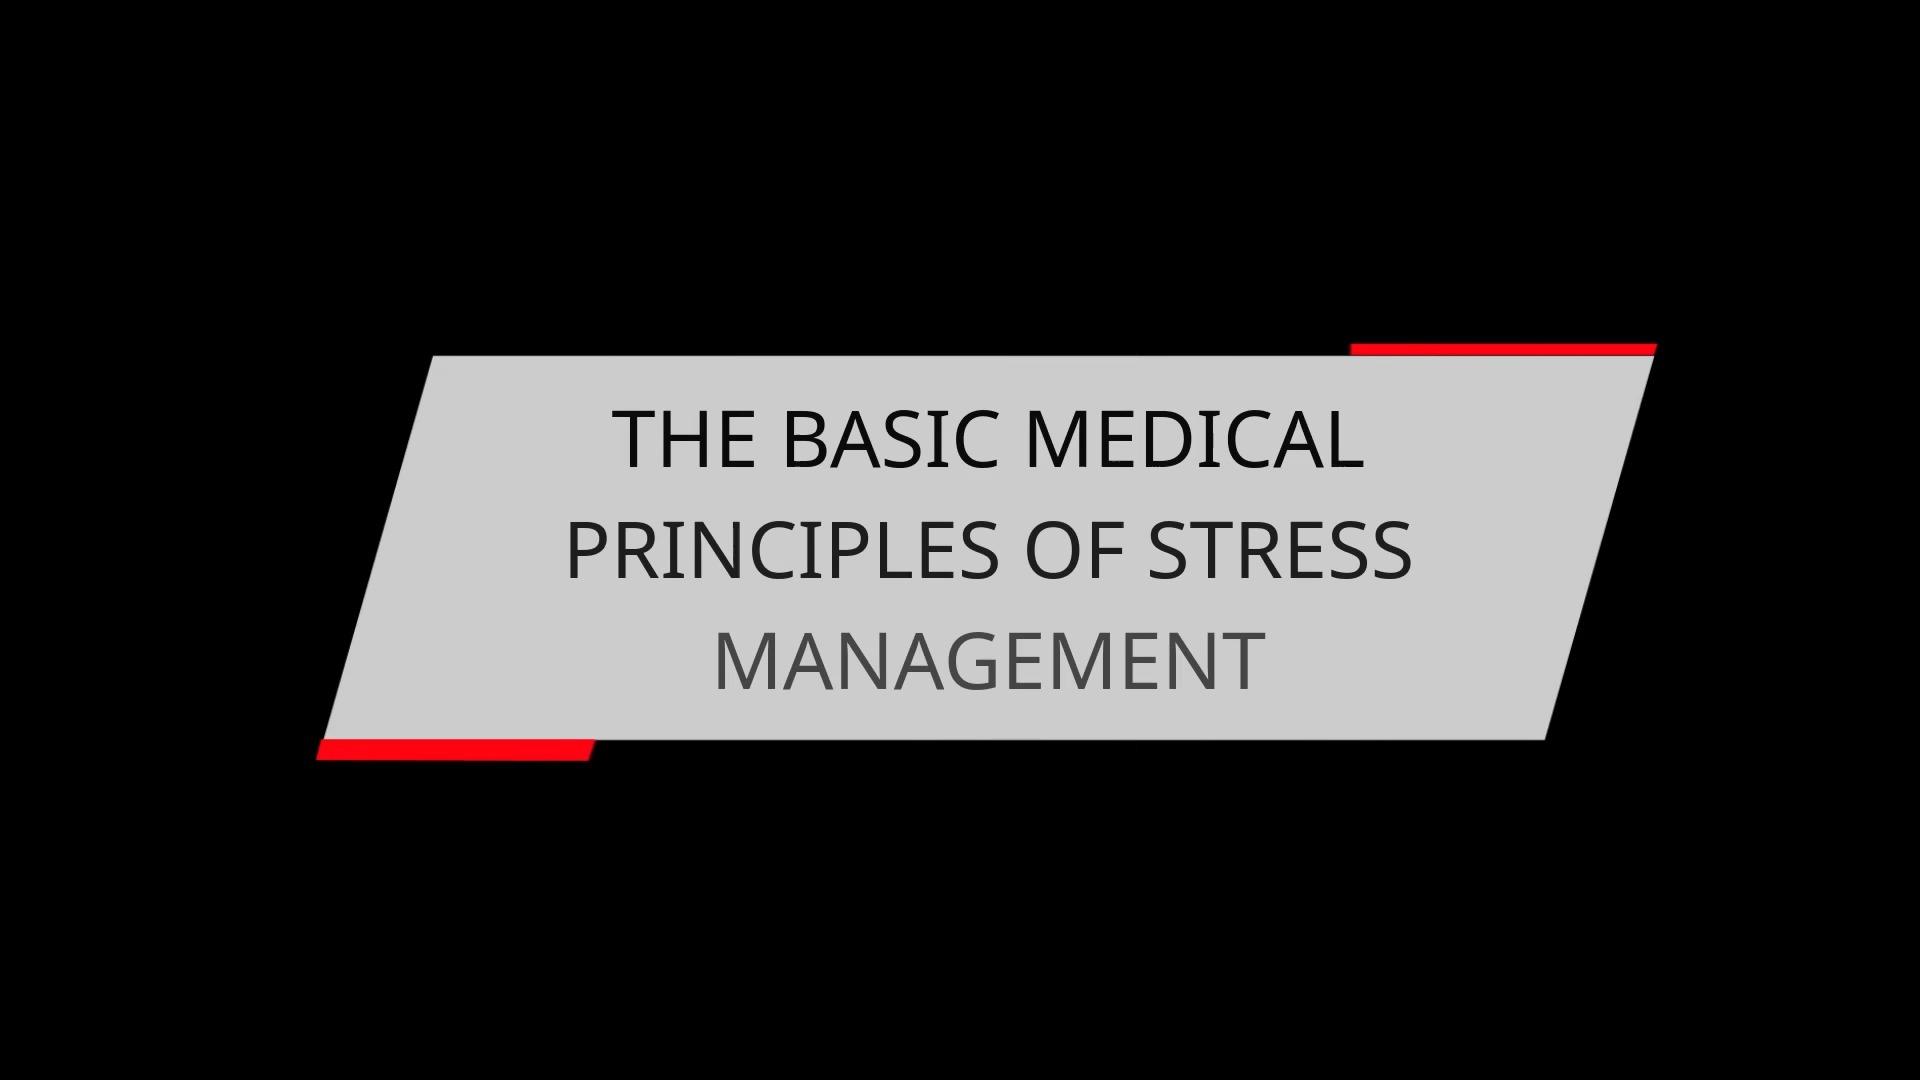 THE BASIC MEDICAL PRINCIPLES OF STRESS MANAGEMENT